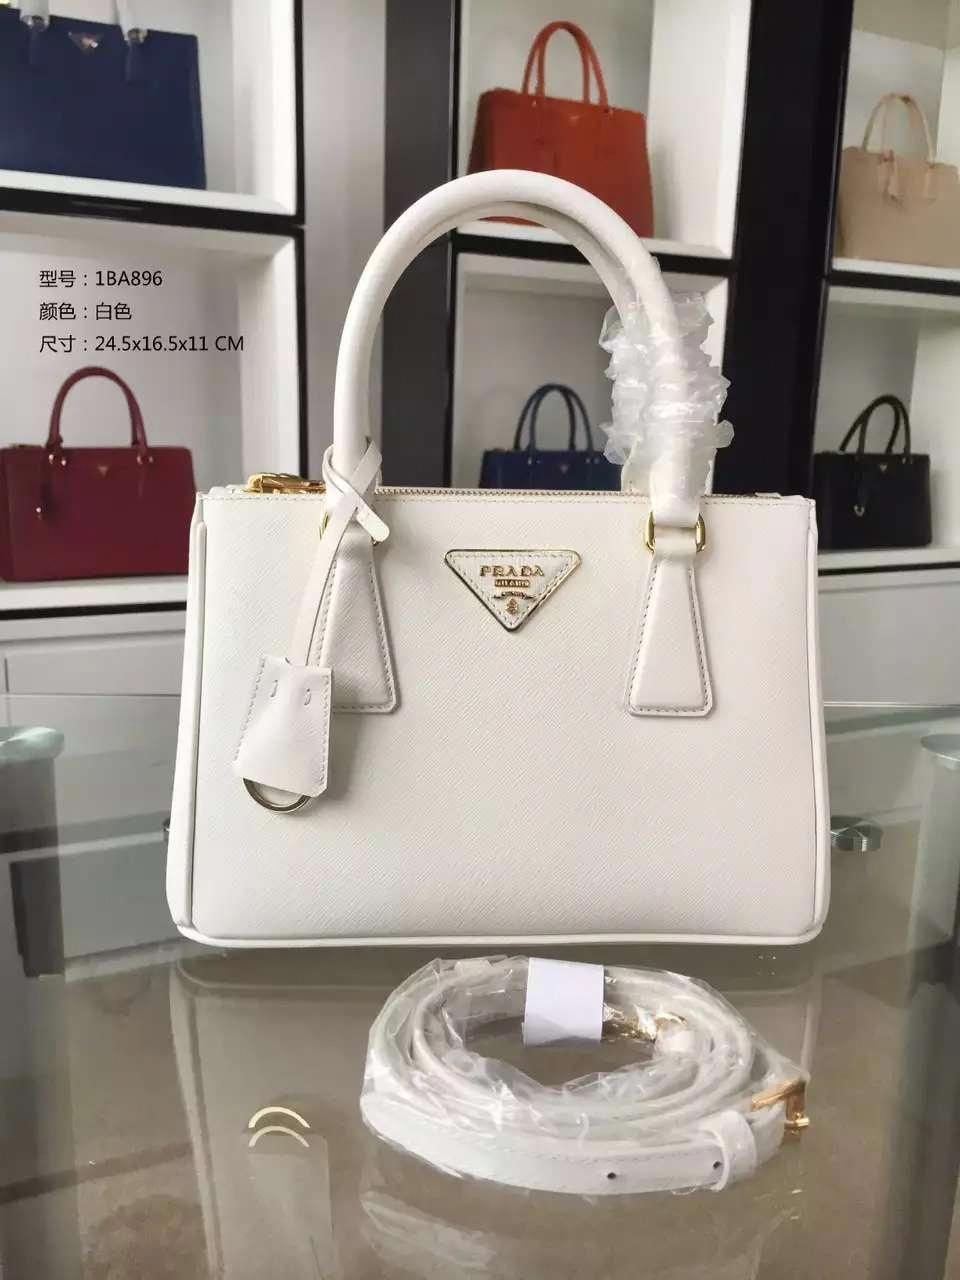 Photo of prada handbags uk #Pradahandbags #designerpursesuk #pursesprada #accessorizehand…